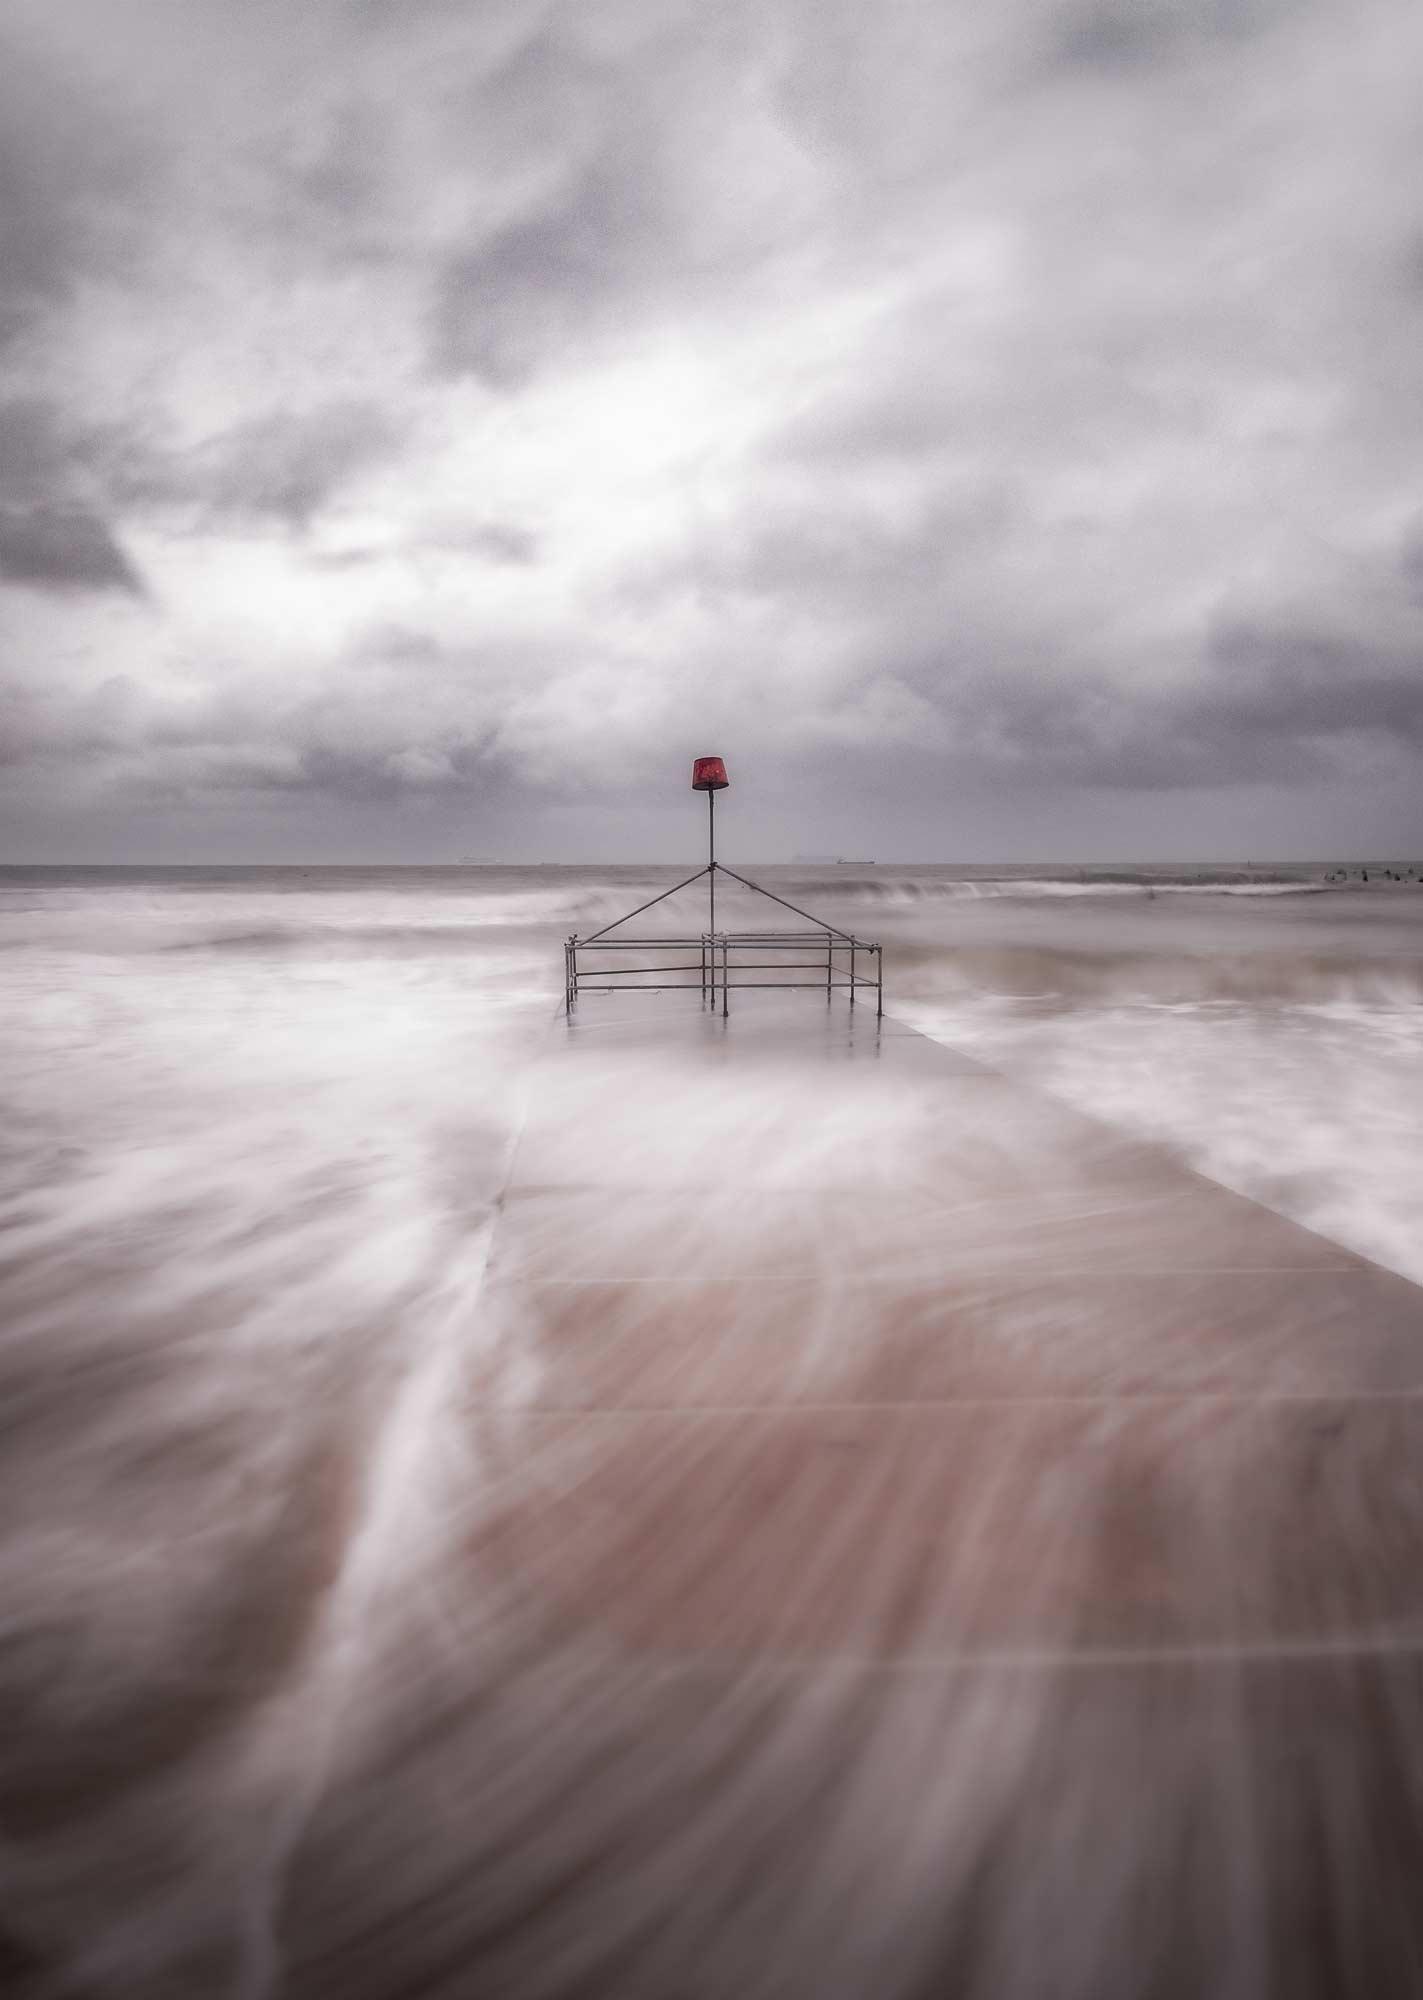 Bournemouth Beach | Stormy 2020